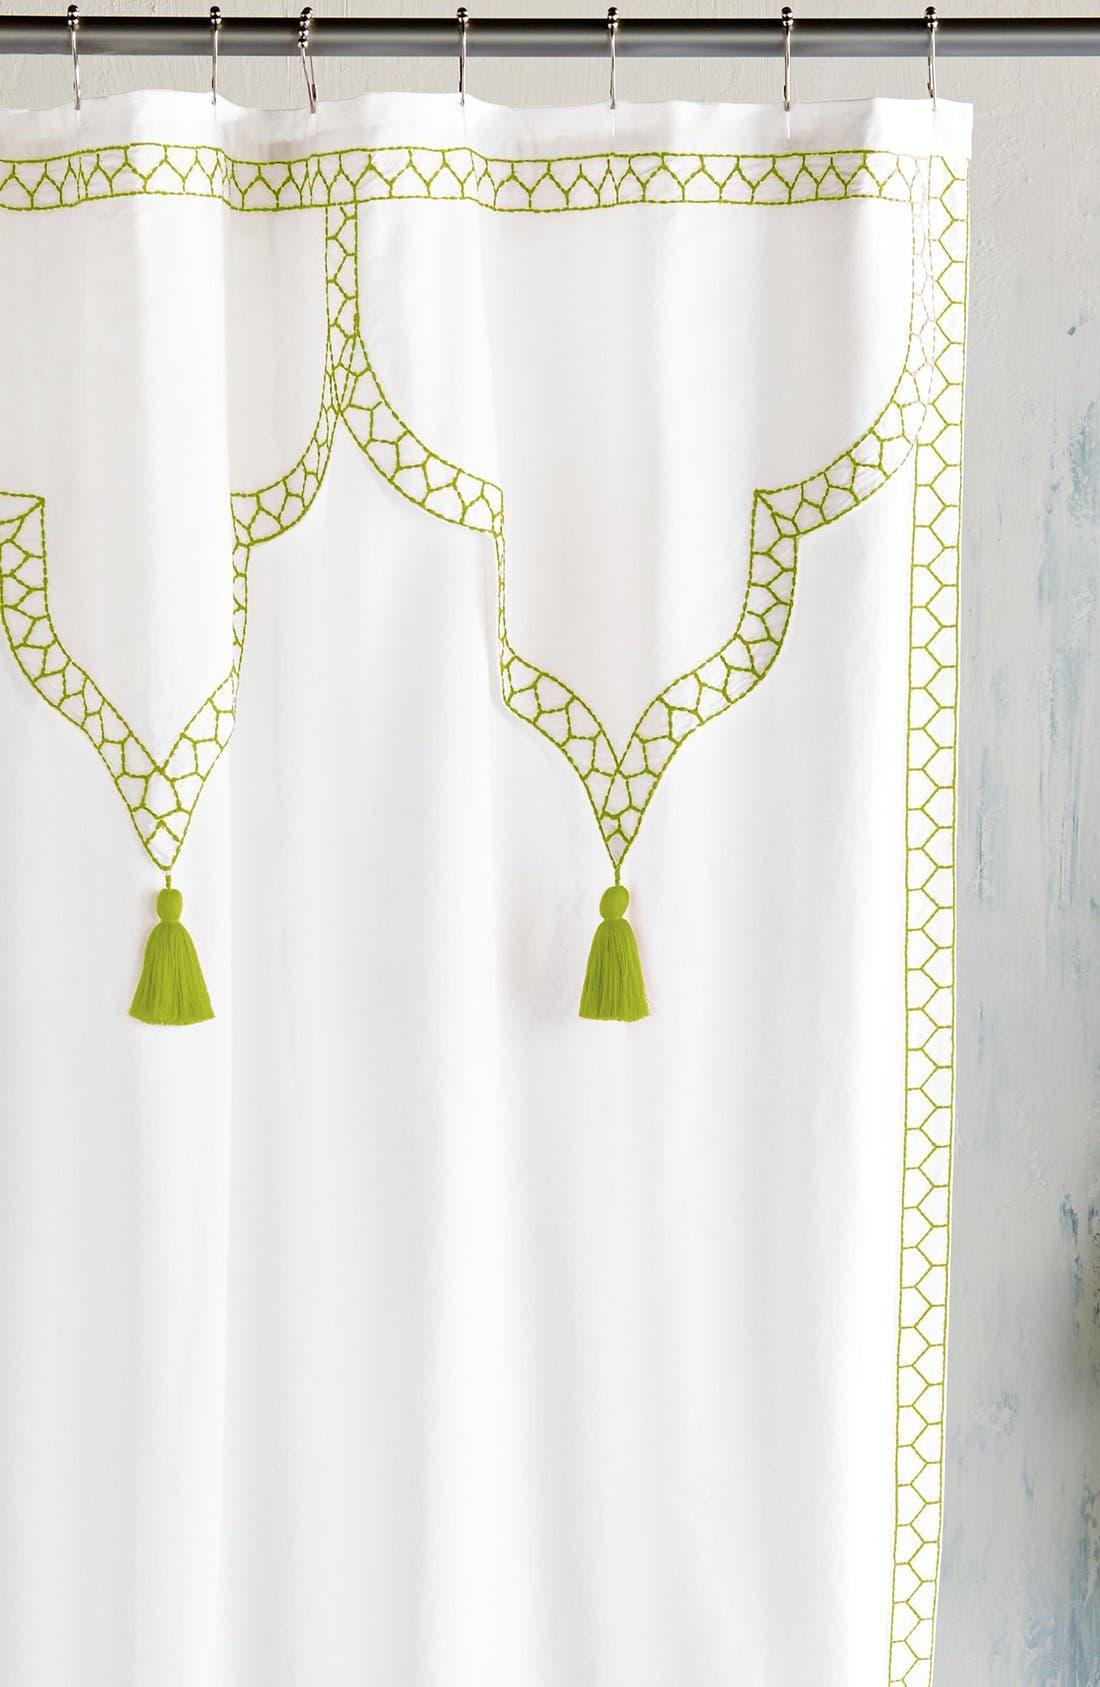 Main Image - John Robshaw Iswar Shower Curtain